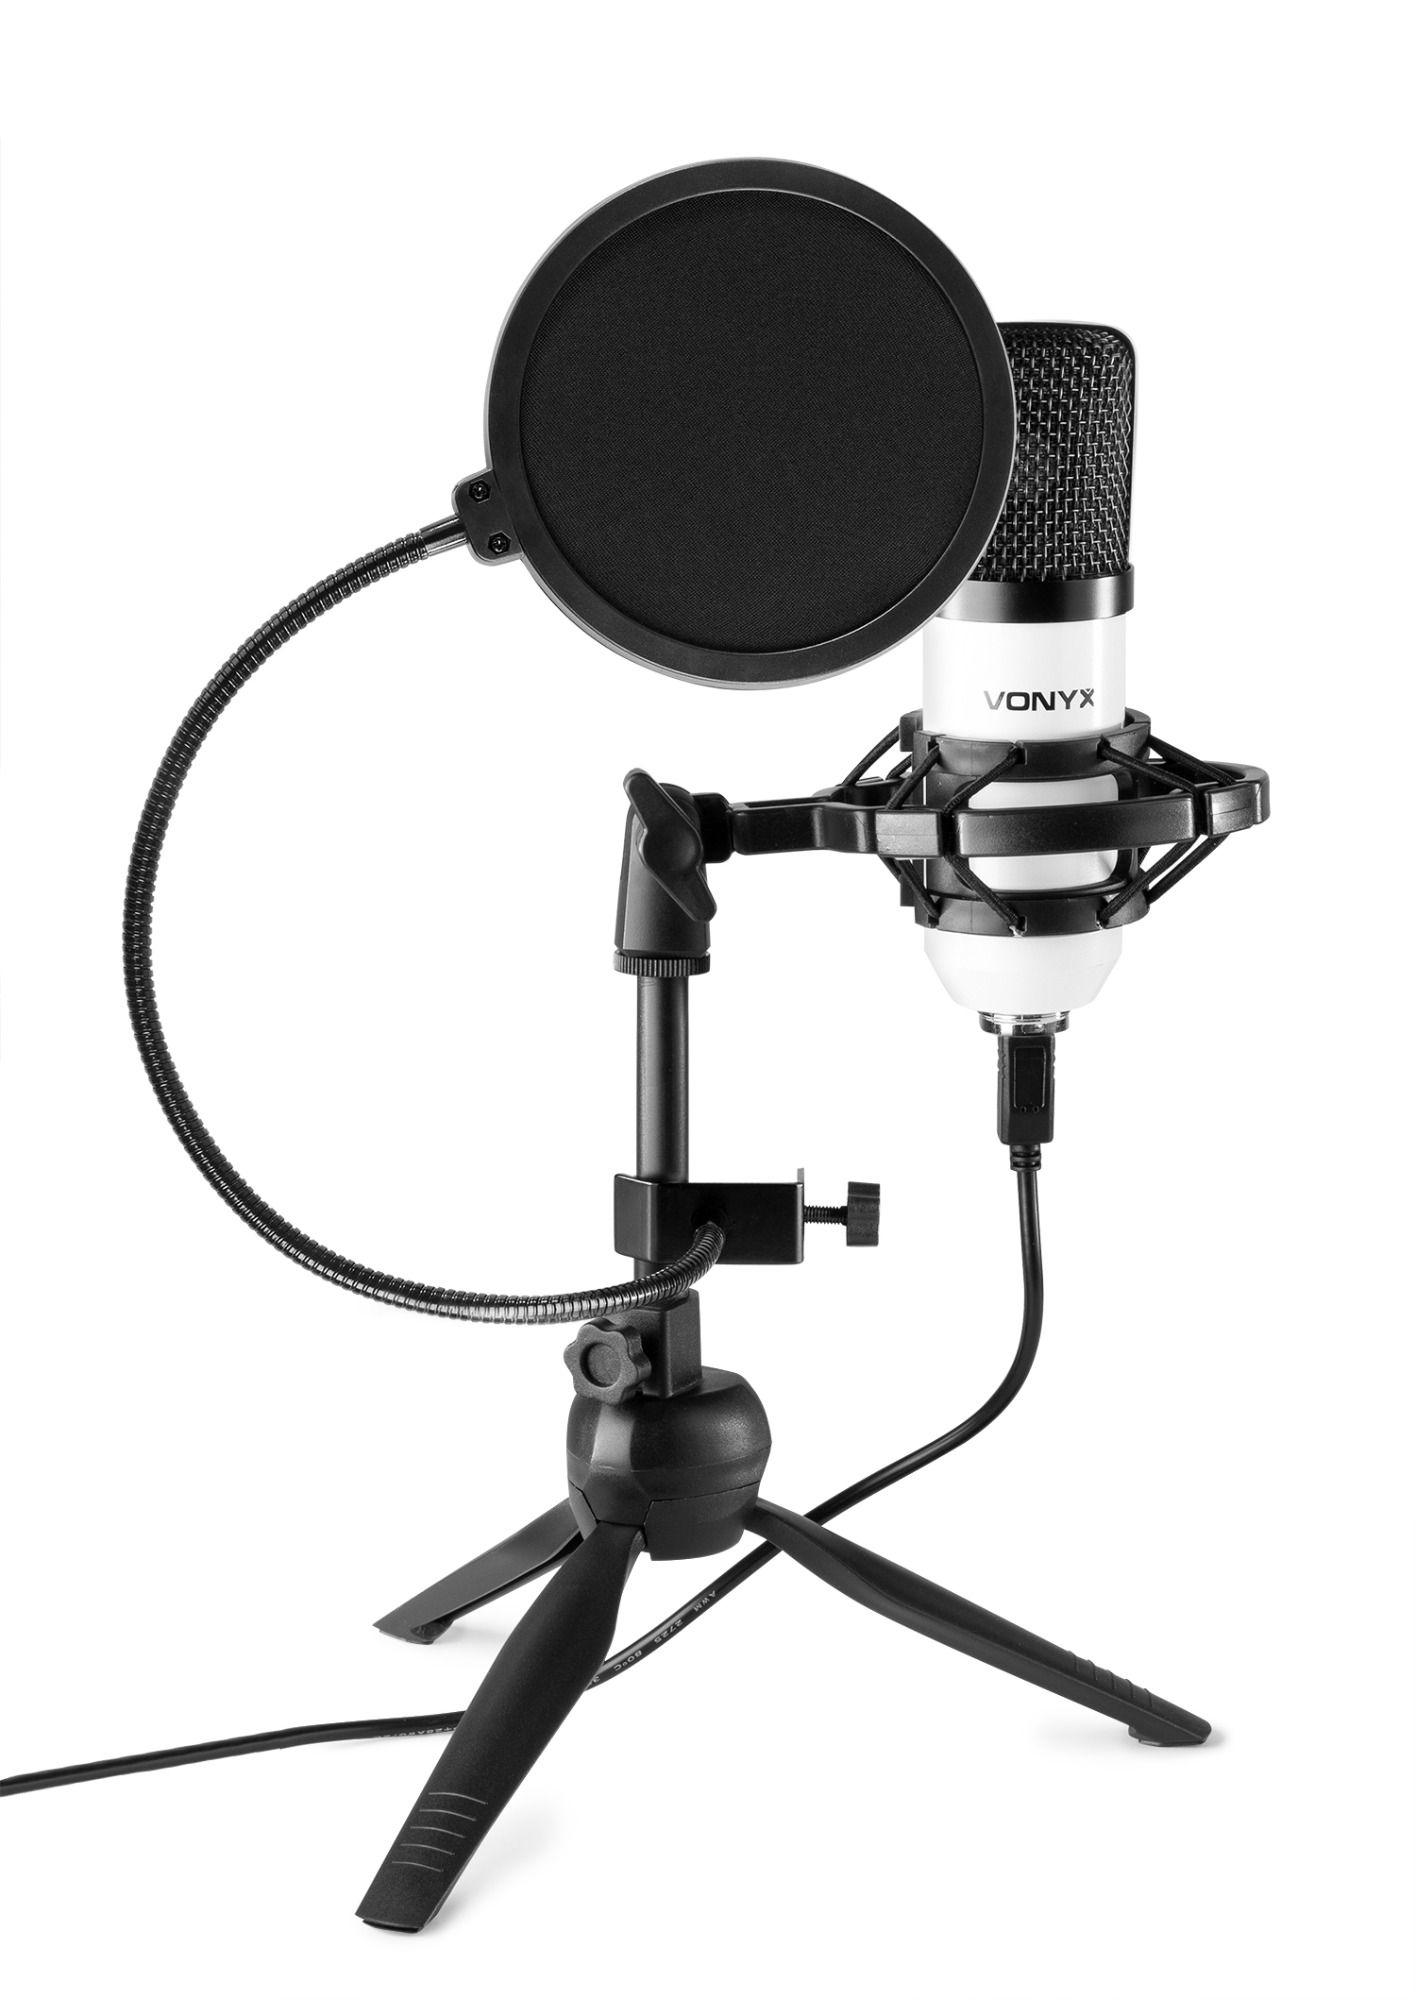 Vonyx CM300W USB studio microfoon met popfilter - Wit